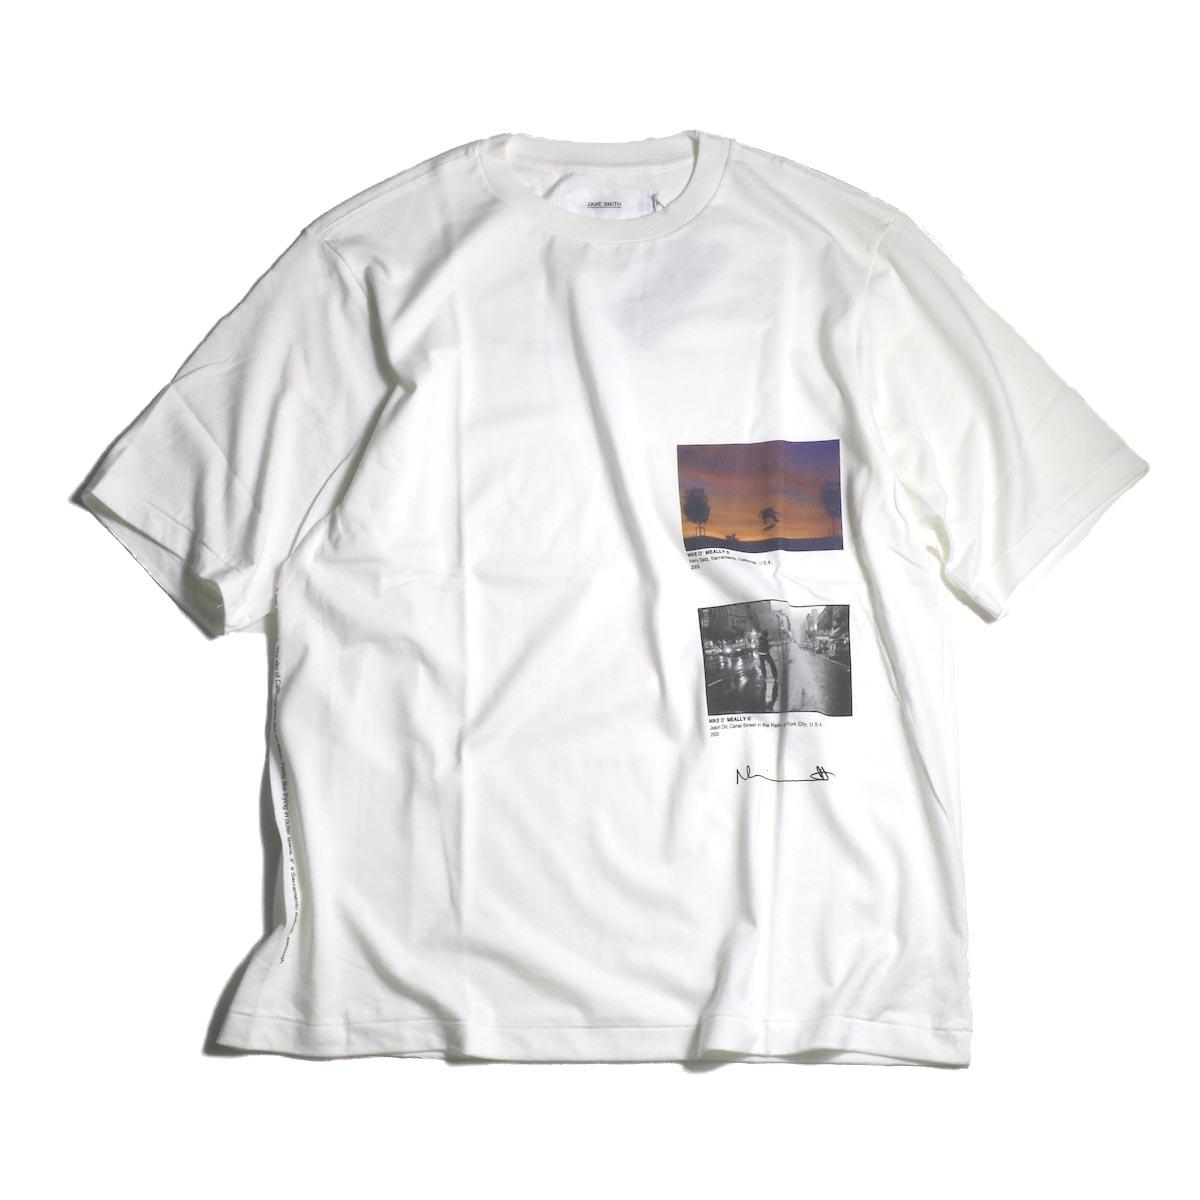 JANE SMITH / Print Tee (KERRY GETZ & JASON DULL,CANAL STREET IN THE RAIN S/S) -White正面